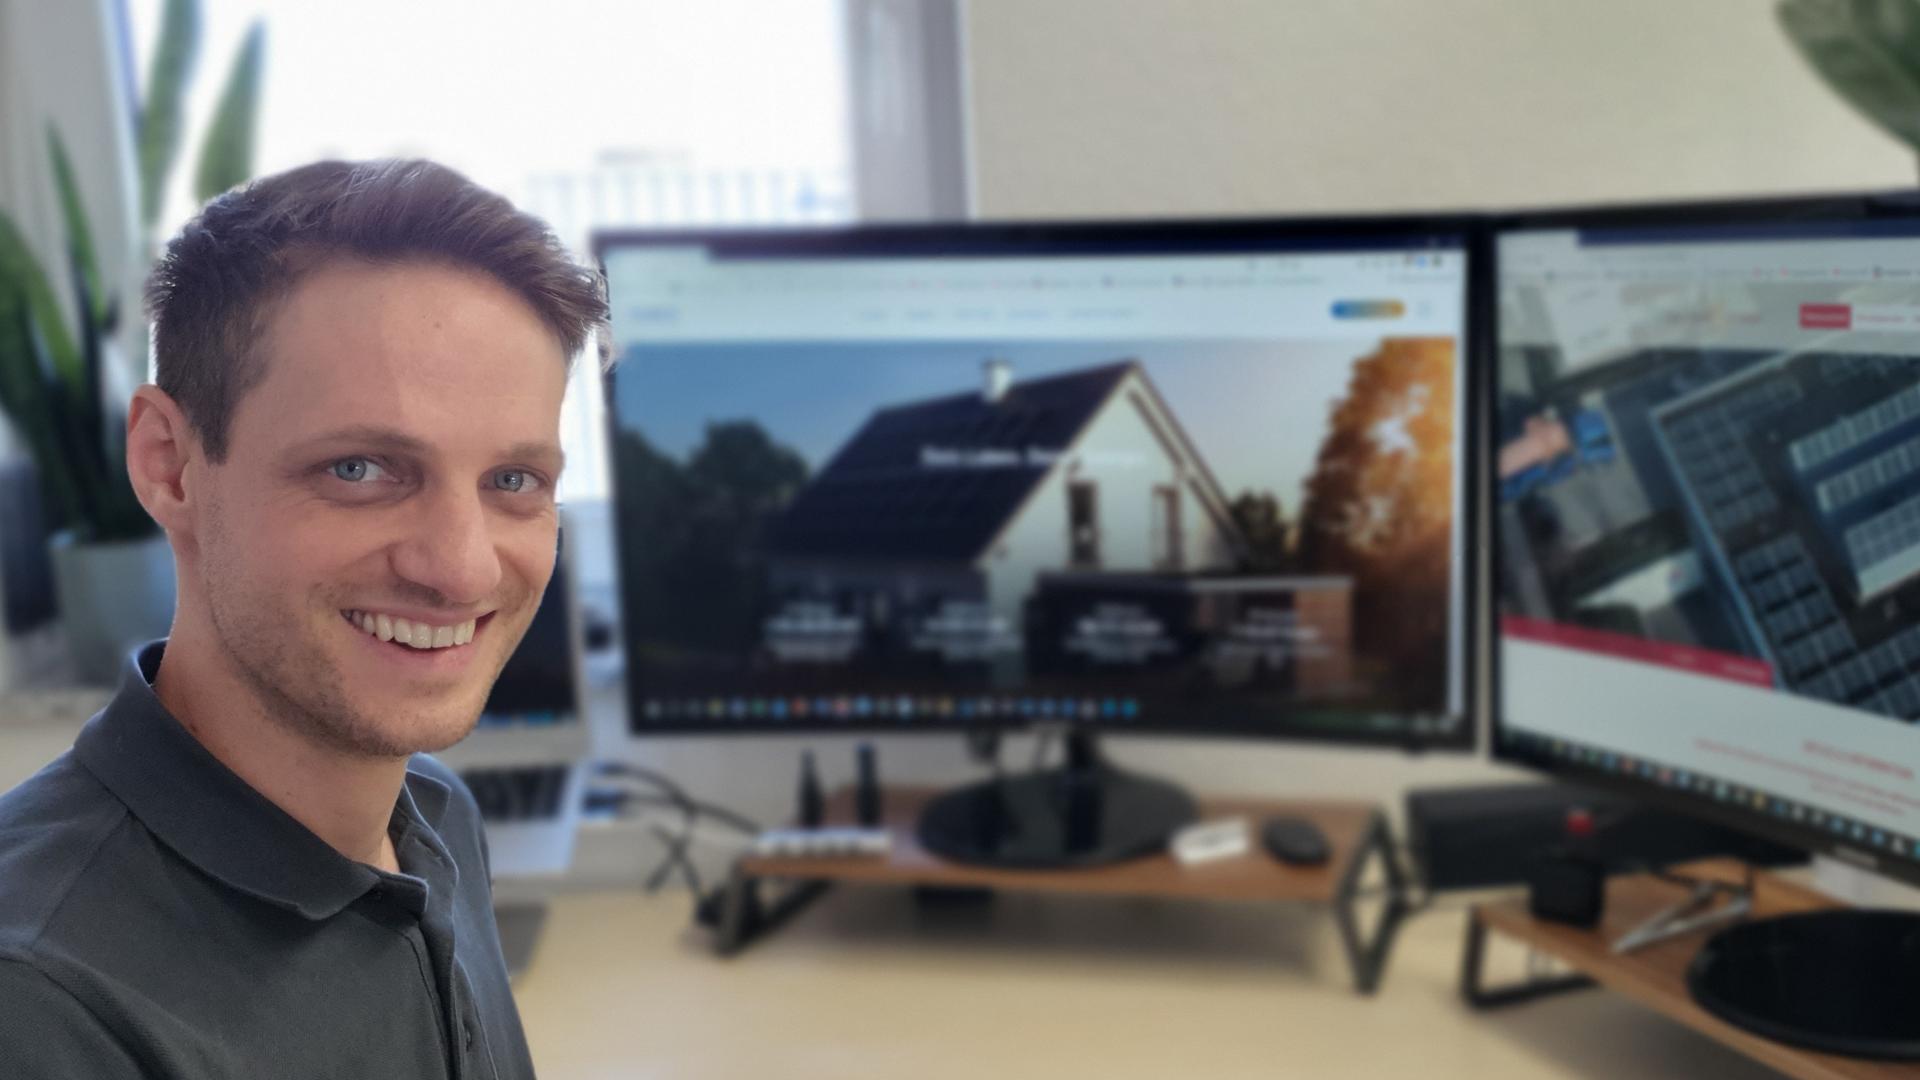 Nils Rufle, Geschäftsleitung & Projektleitung